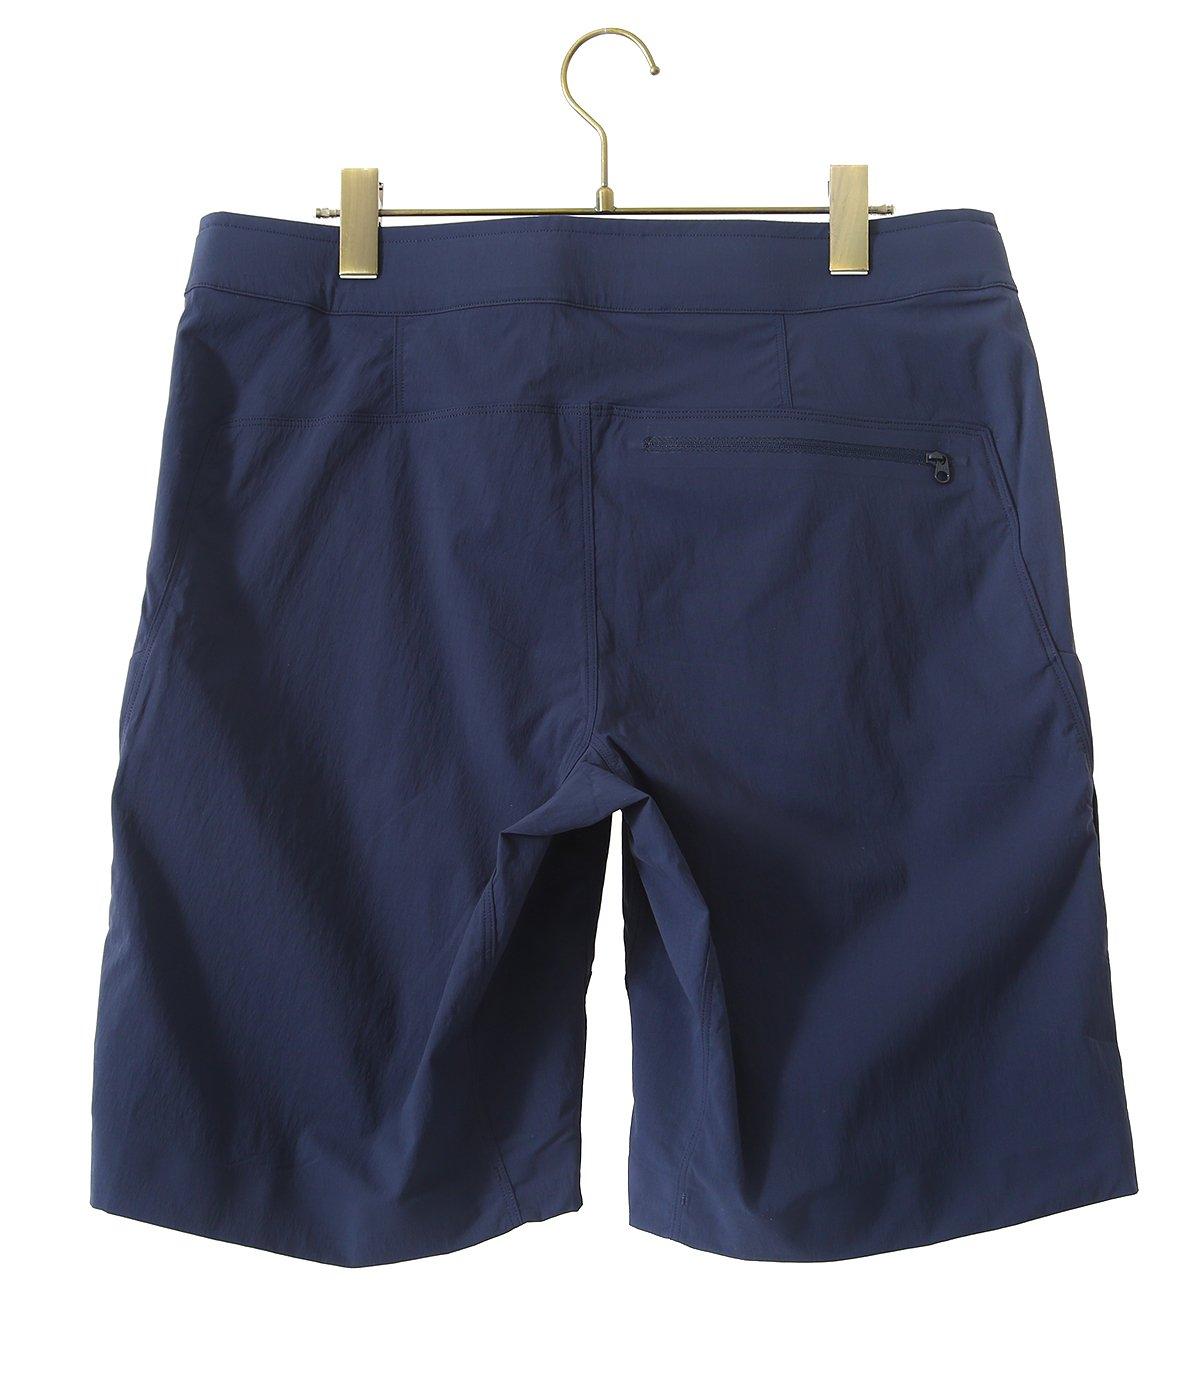 Palisade Short Men's -Cobalt Moon-